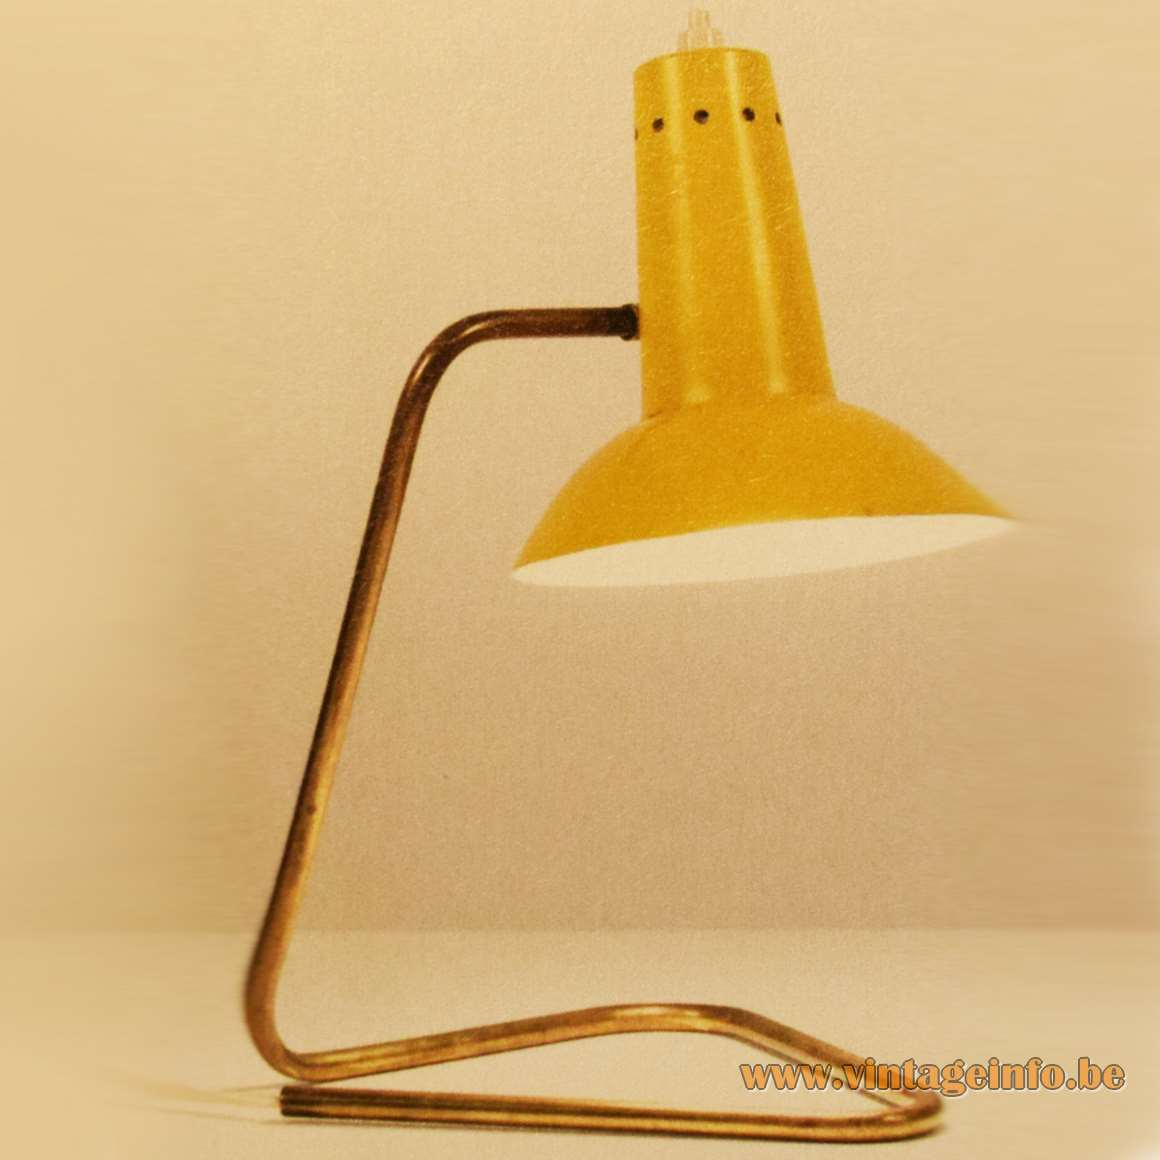 Gino Sarfatti, 551 desk or wall lamp for Arteluce, 1952